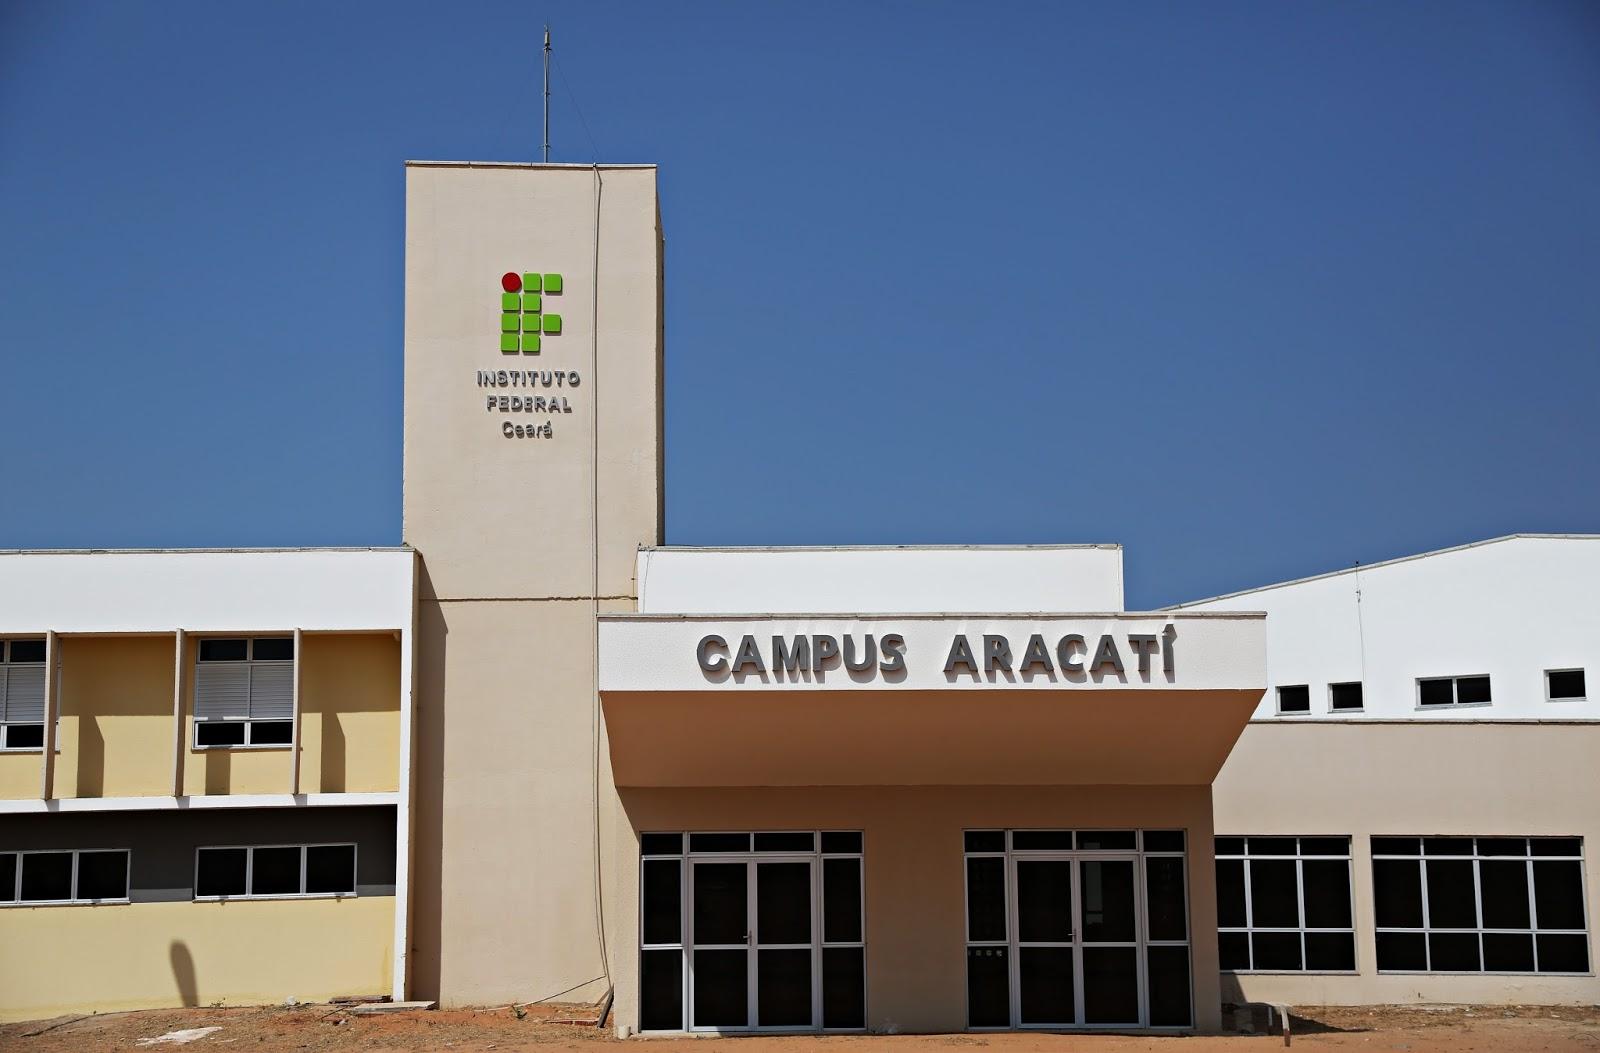 campus-de-aracati-abre-125-vagas-em-cursos-tecnicos.